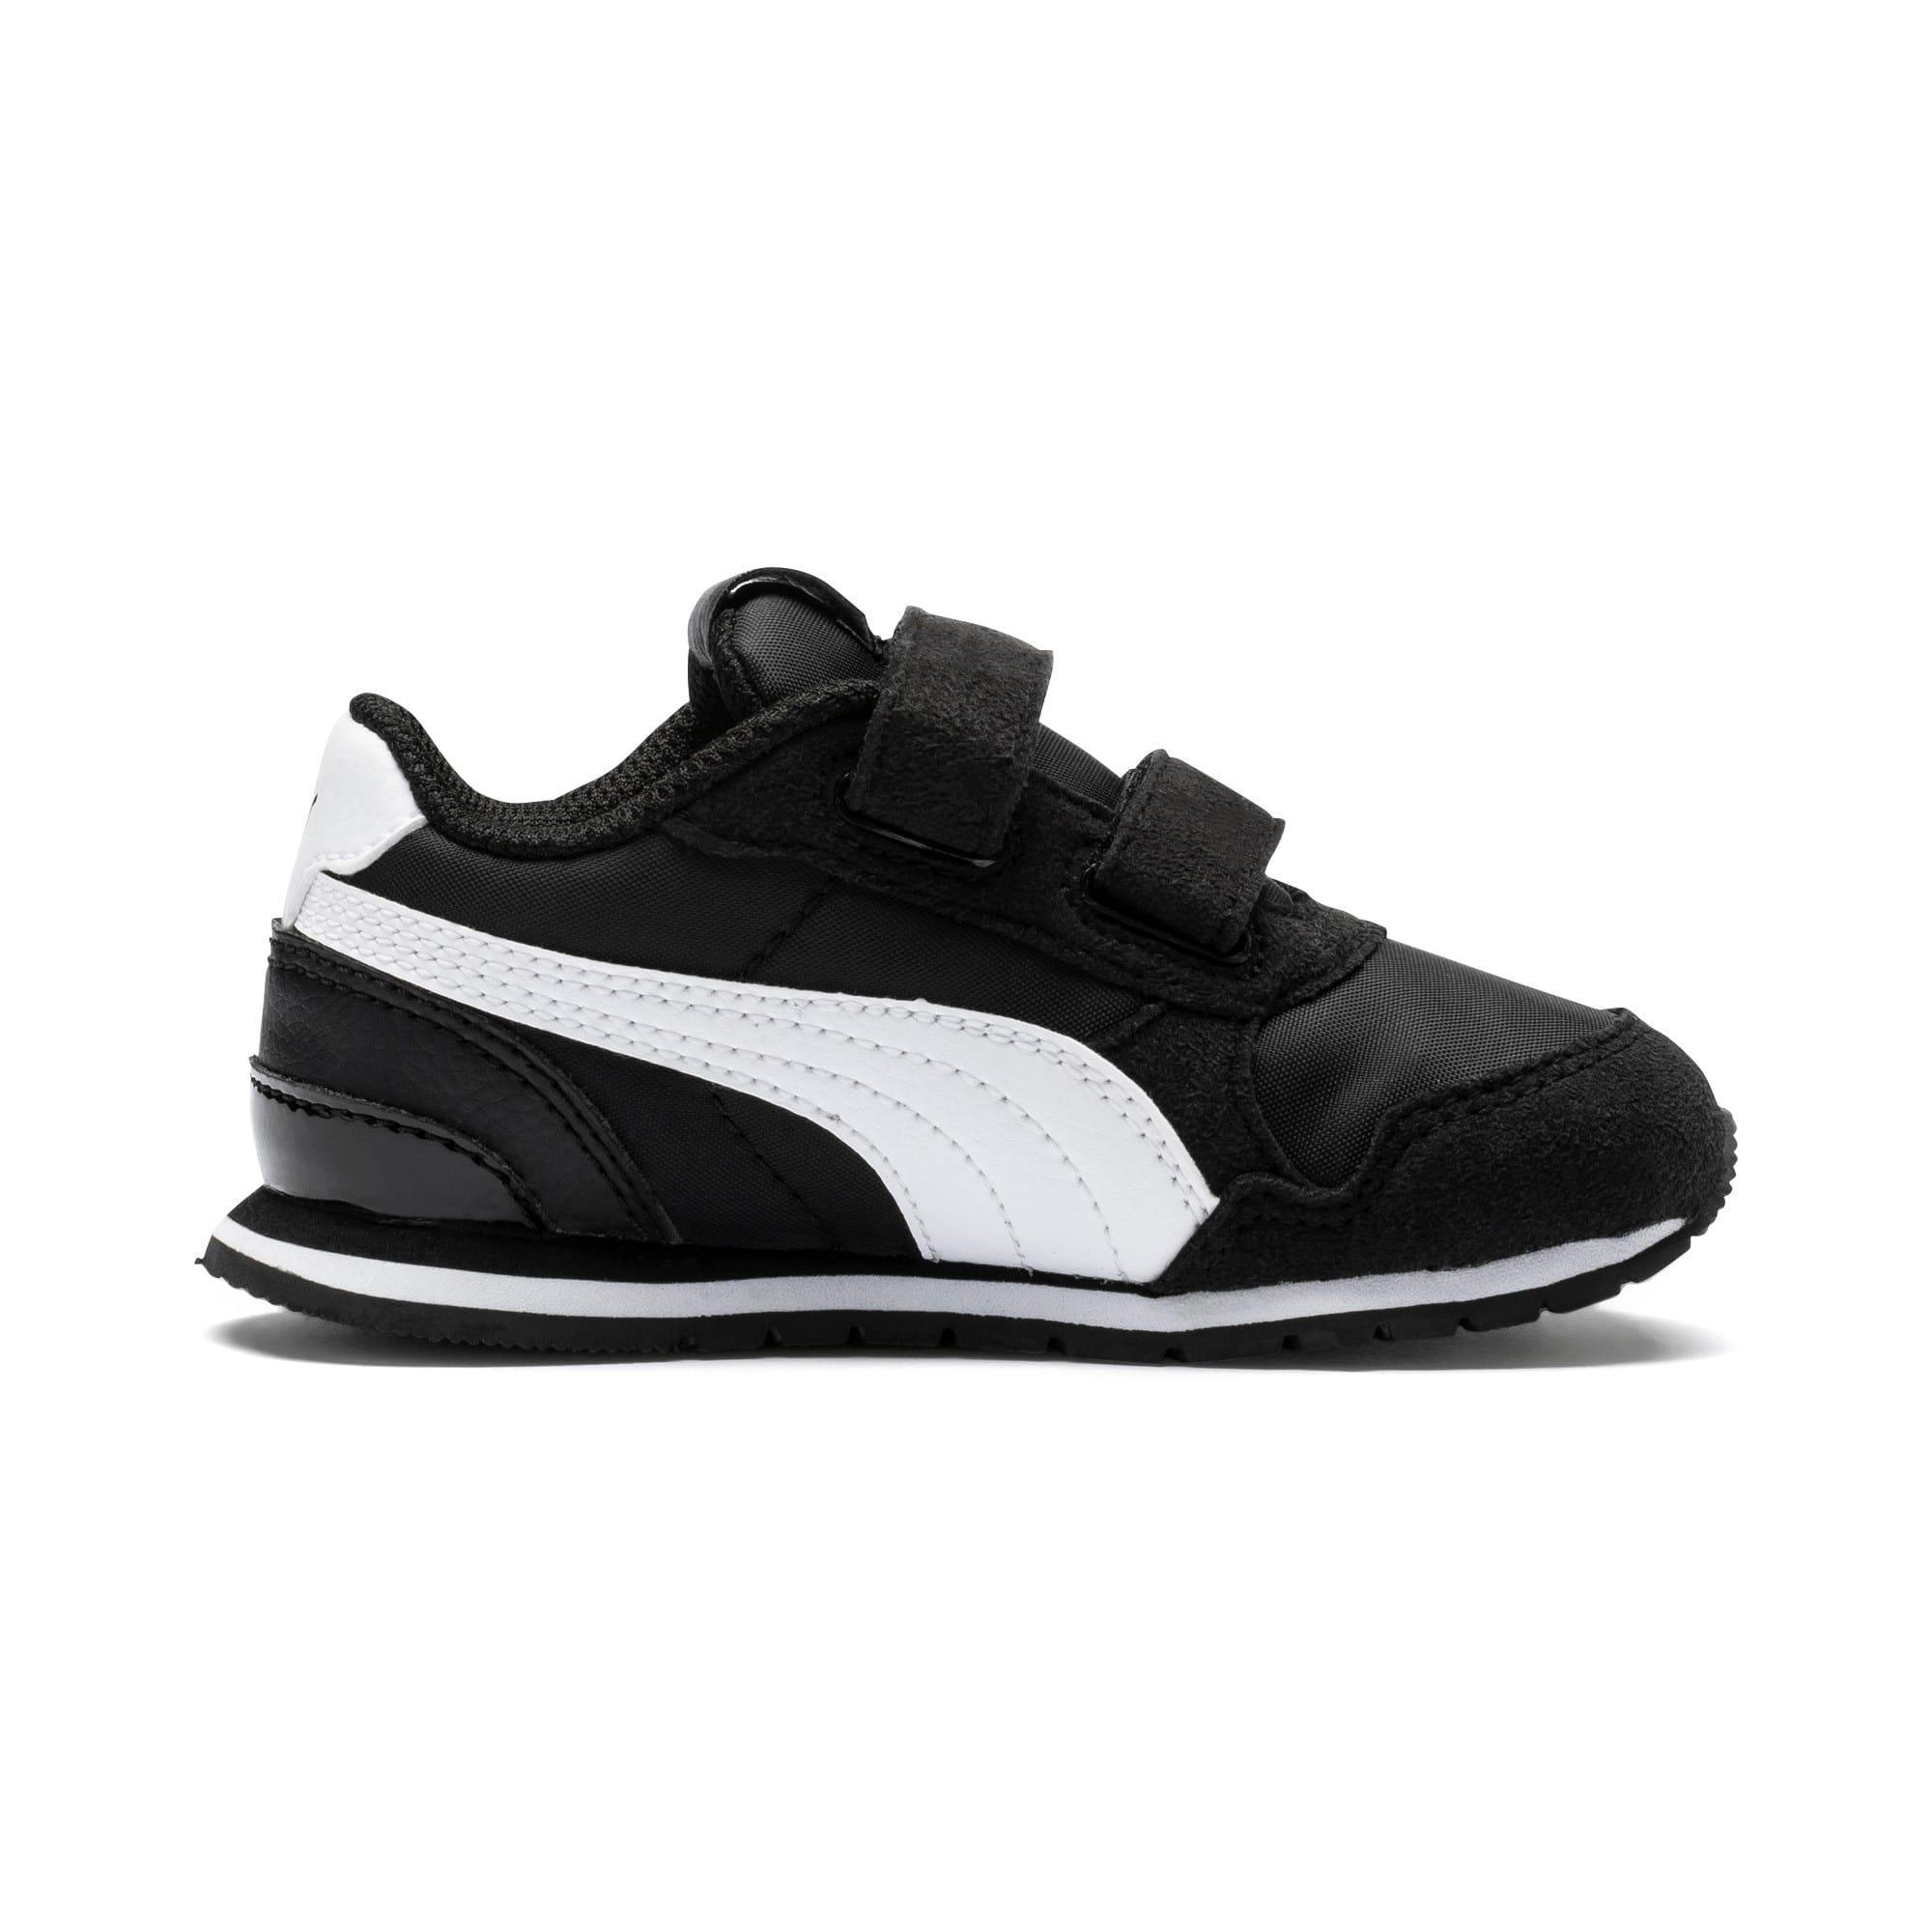 Thumbnail 5 of ST Runner V2 V Toddler Shoes, Puma Black-Puma White, medium